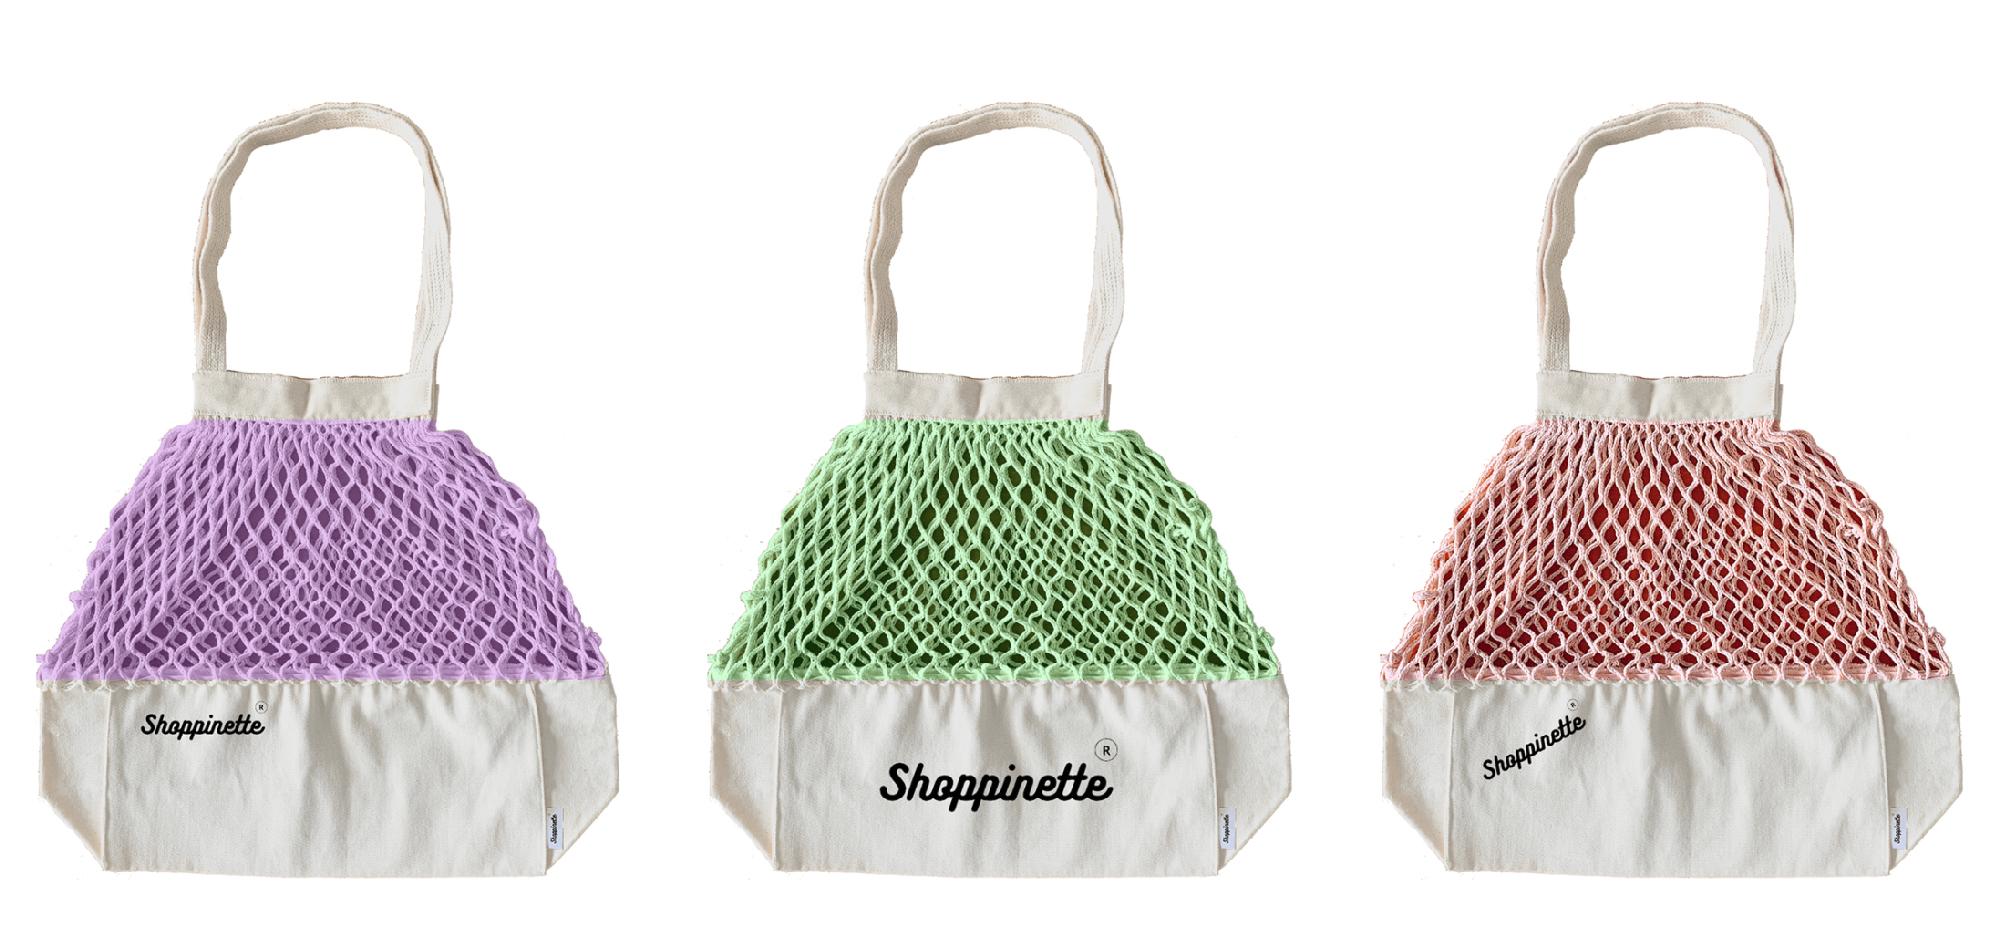 shoppinette-gamme